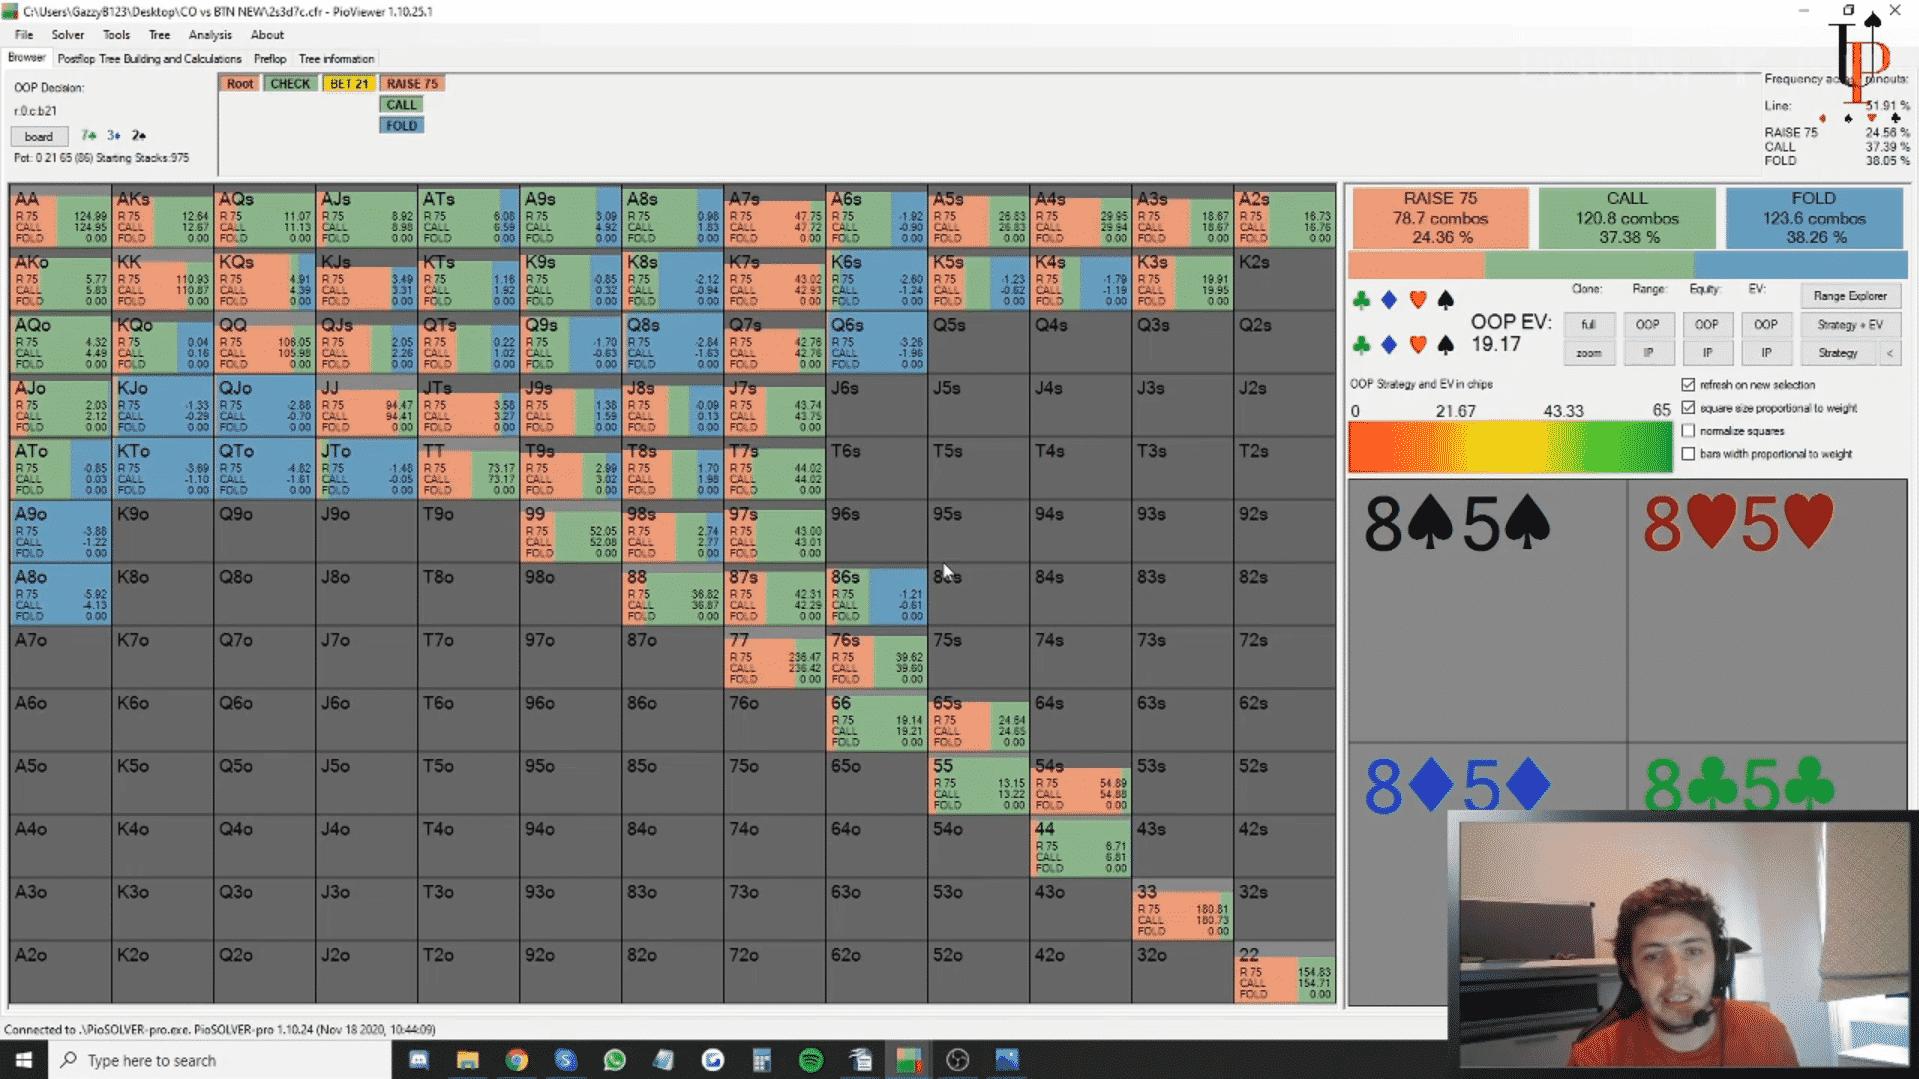 gary blackwood sim screenshot